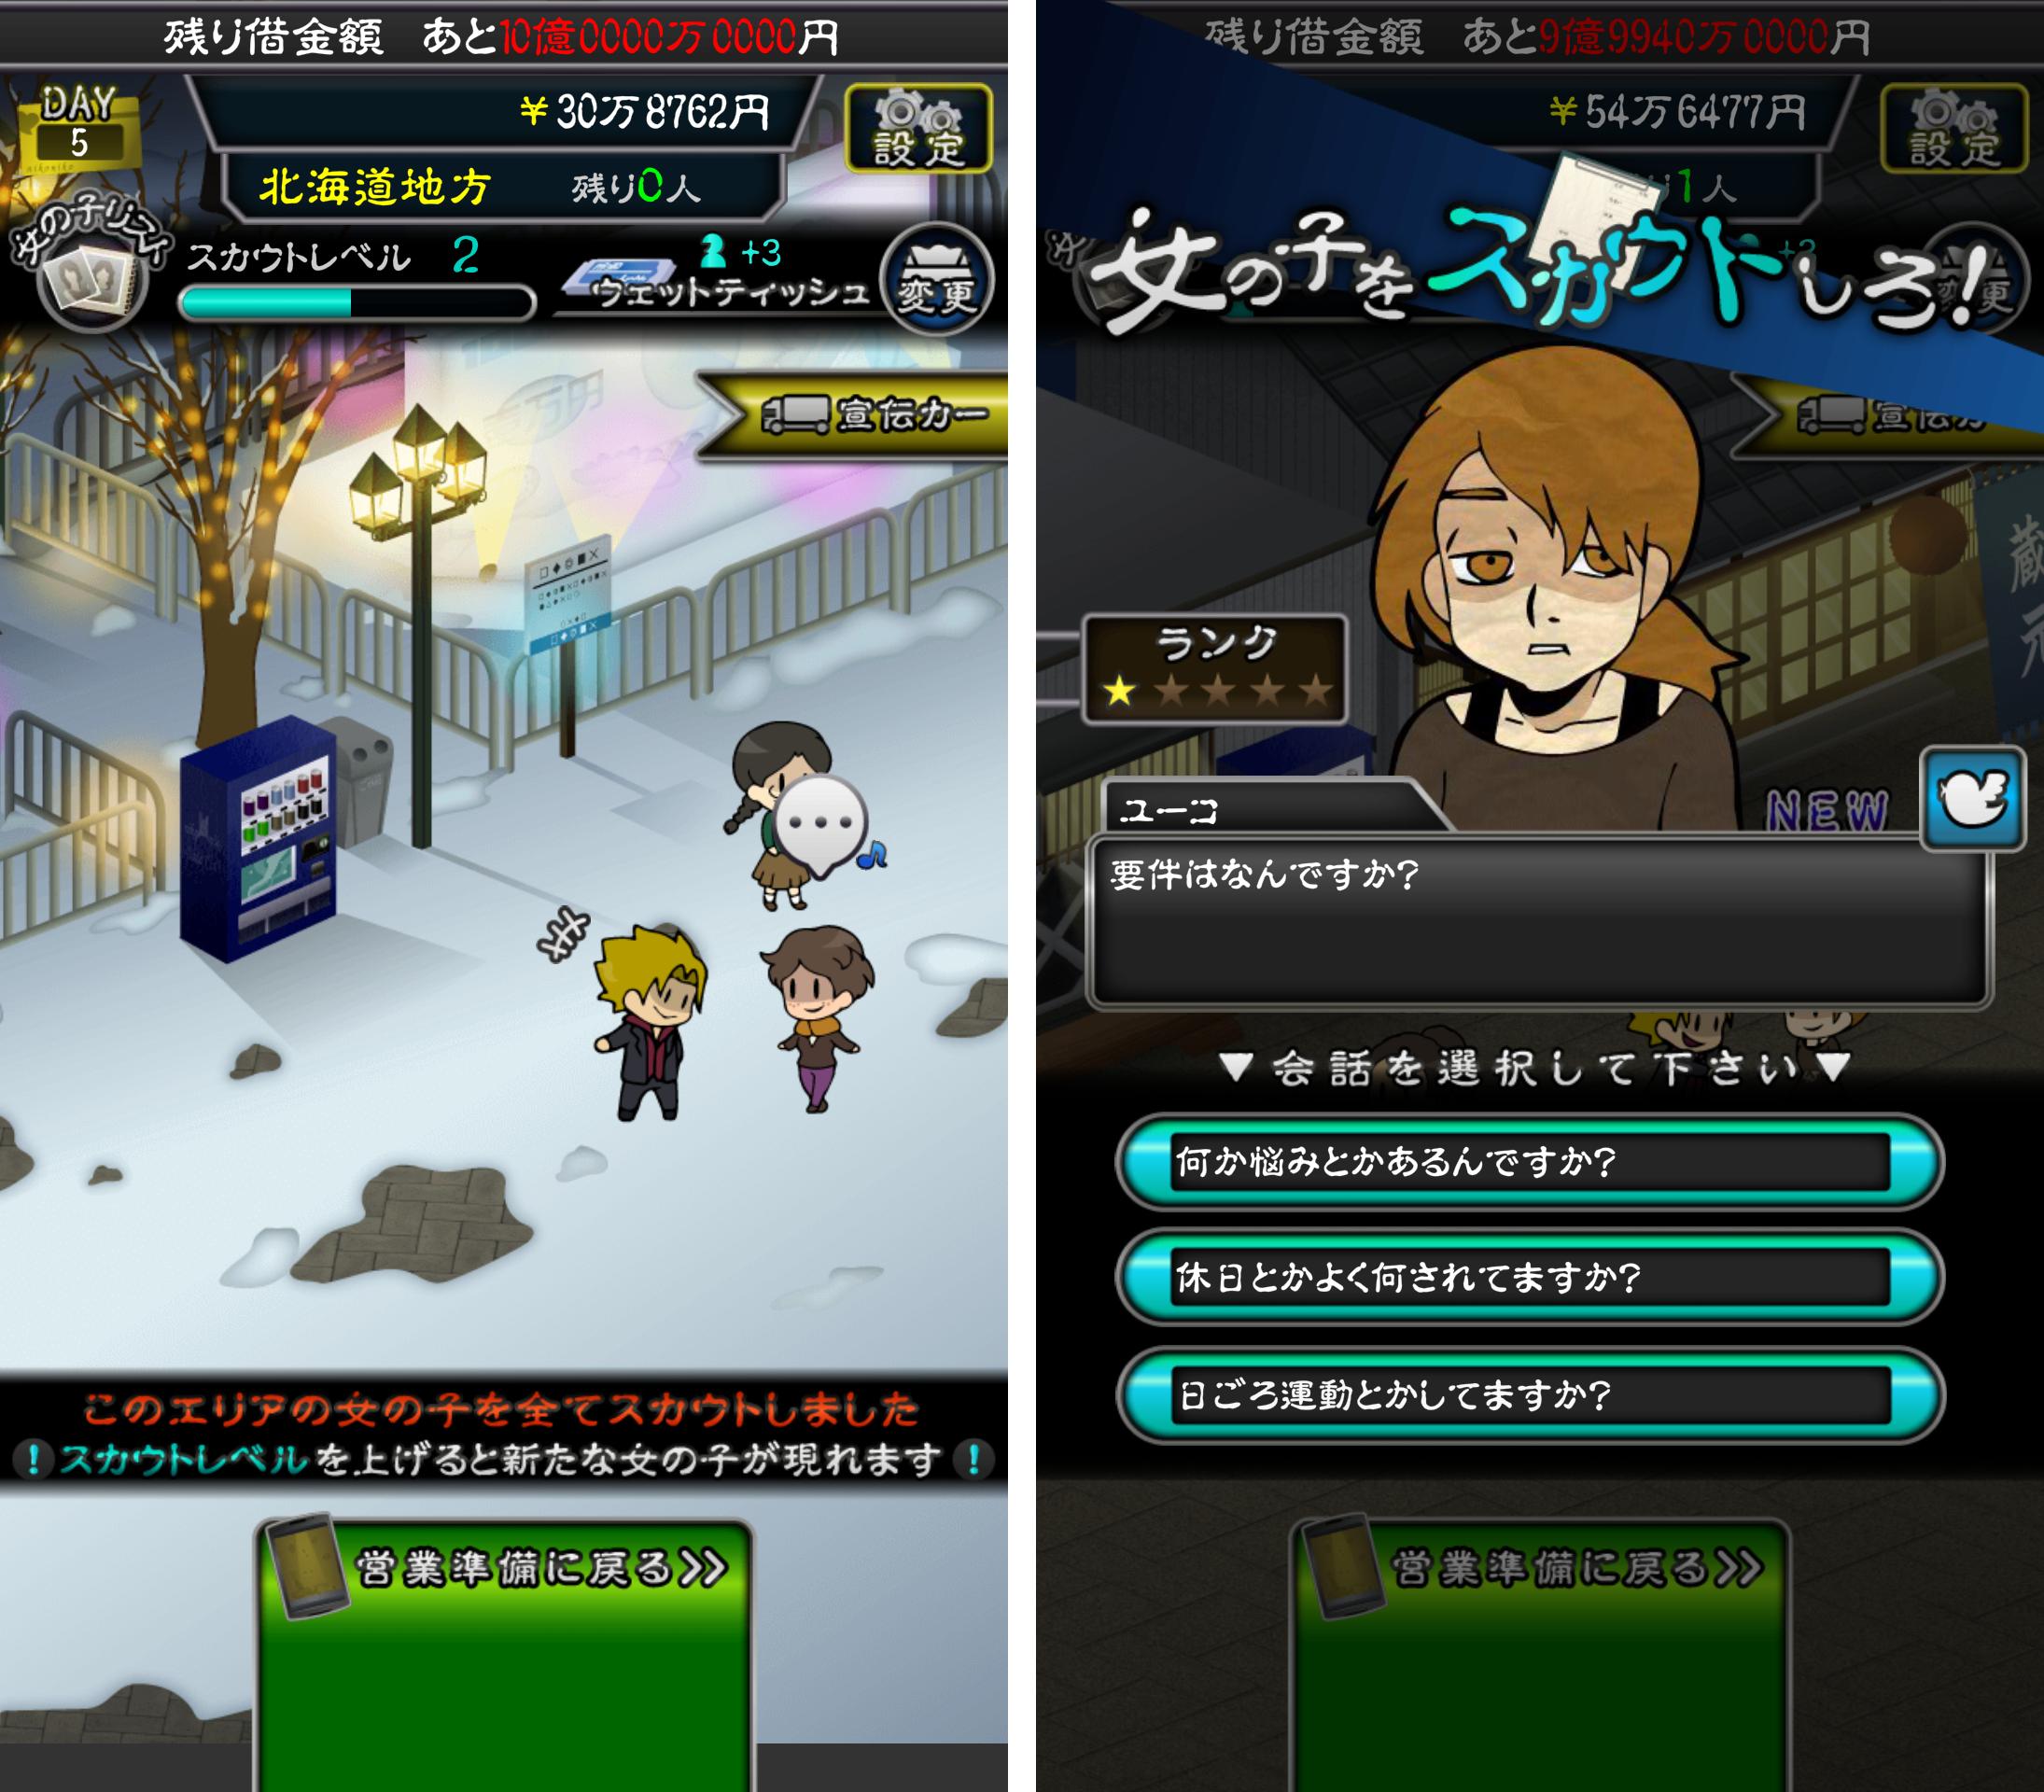 androidアプリ ニコニコ交際倶楽部攻略スクリーンショット3